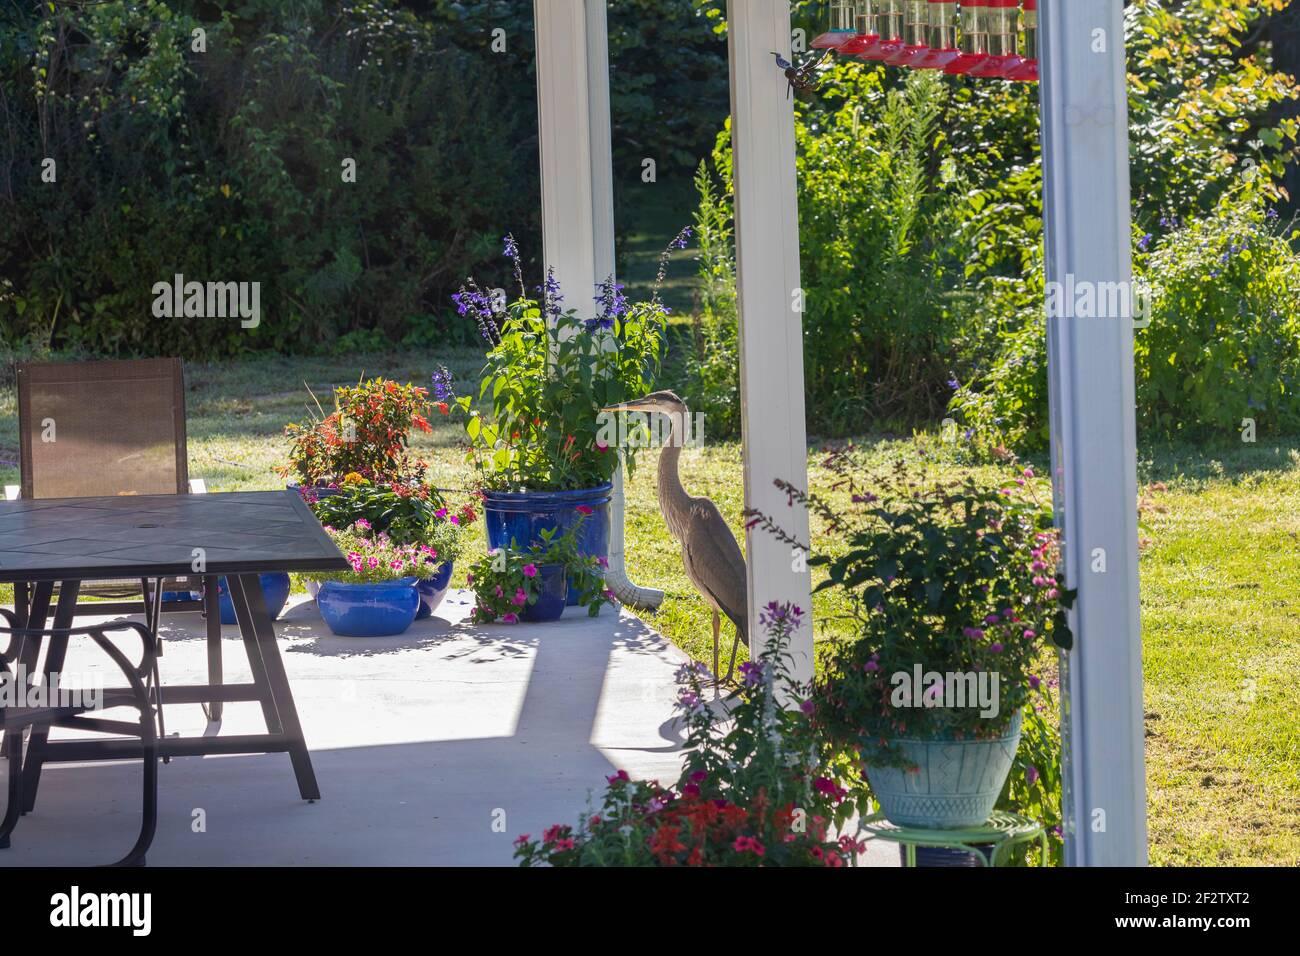 00684-05416 Great Blue Heron (Ardea herodias) on patio garden Marion Co. IL Stock Photo